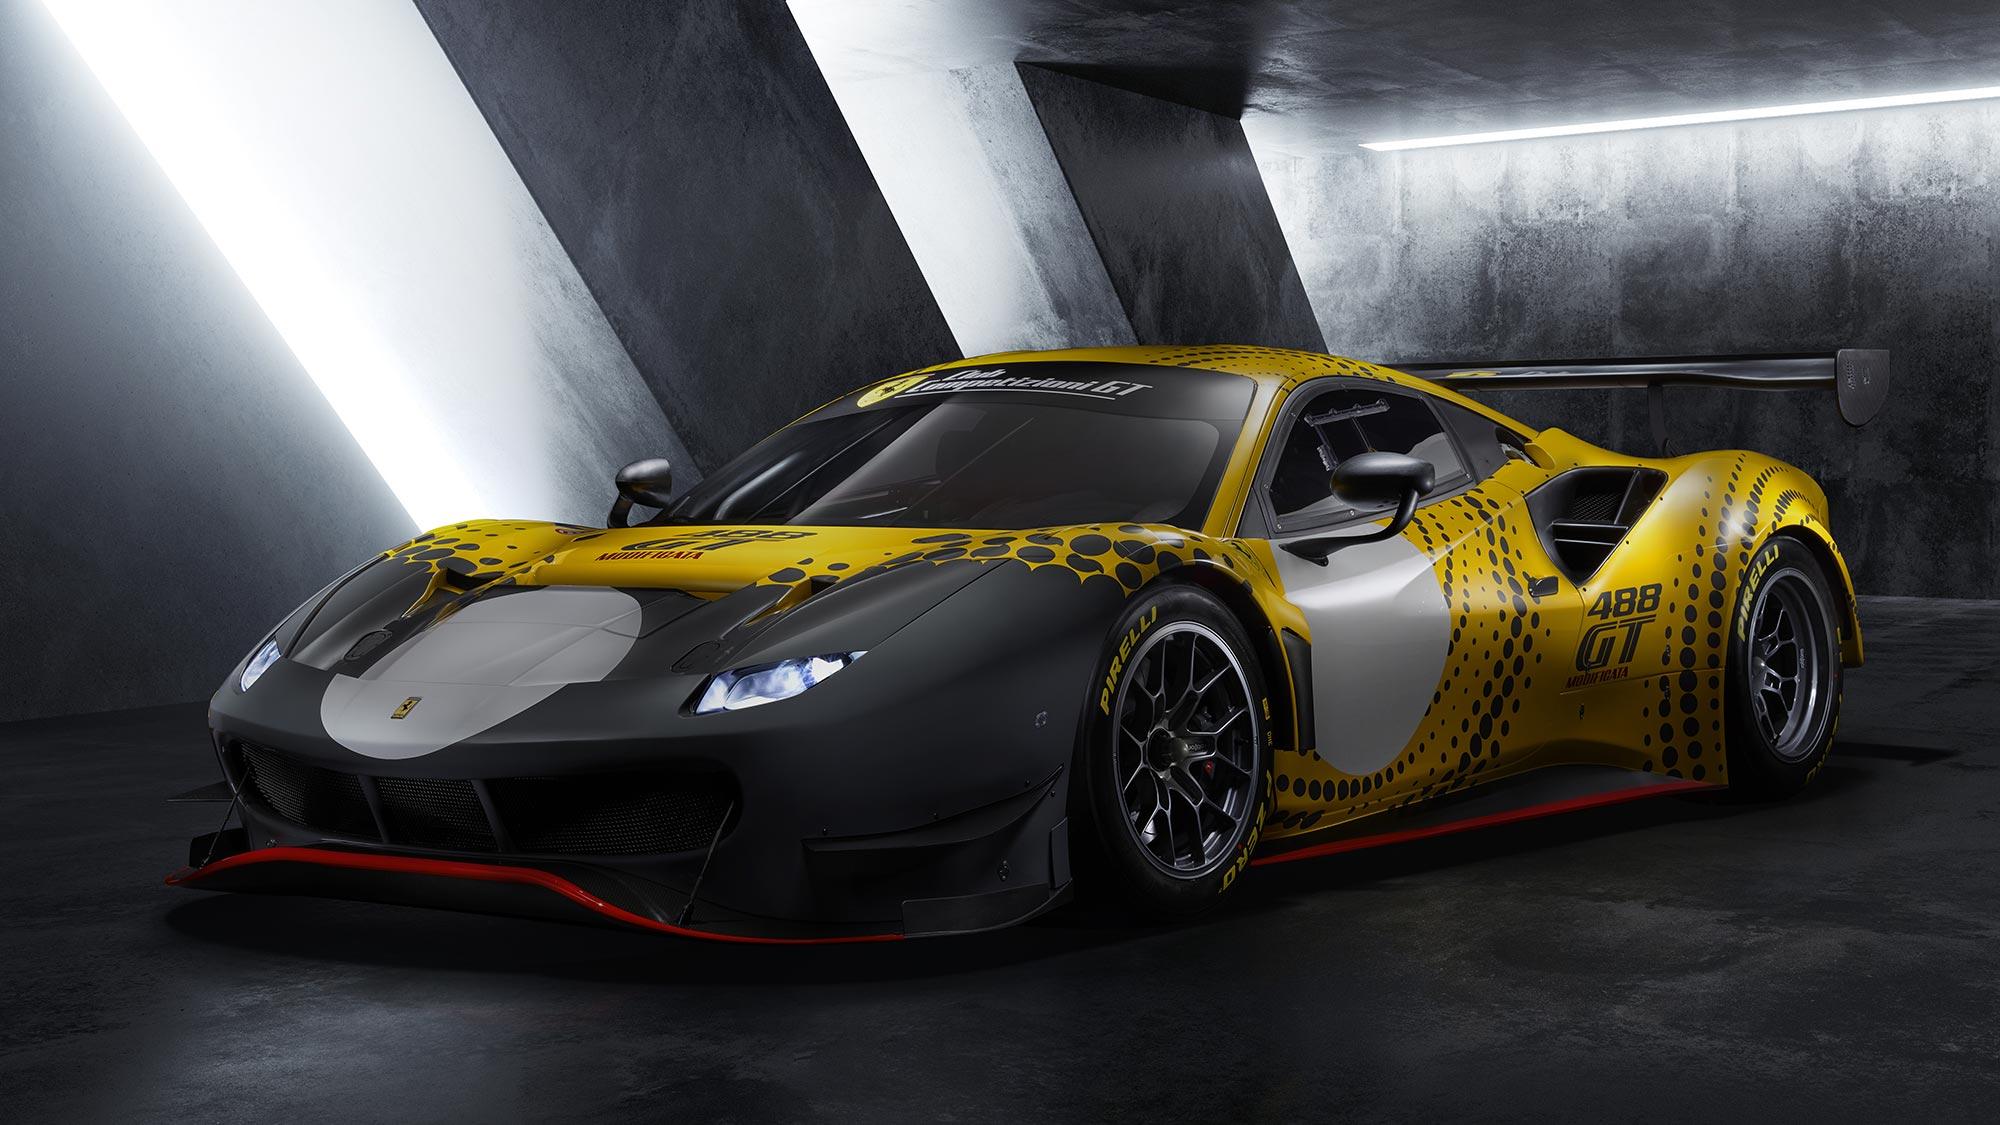 Ferrari 488 GT Modificata Track-only Sports Car